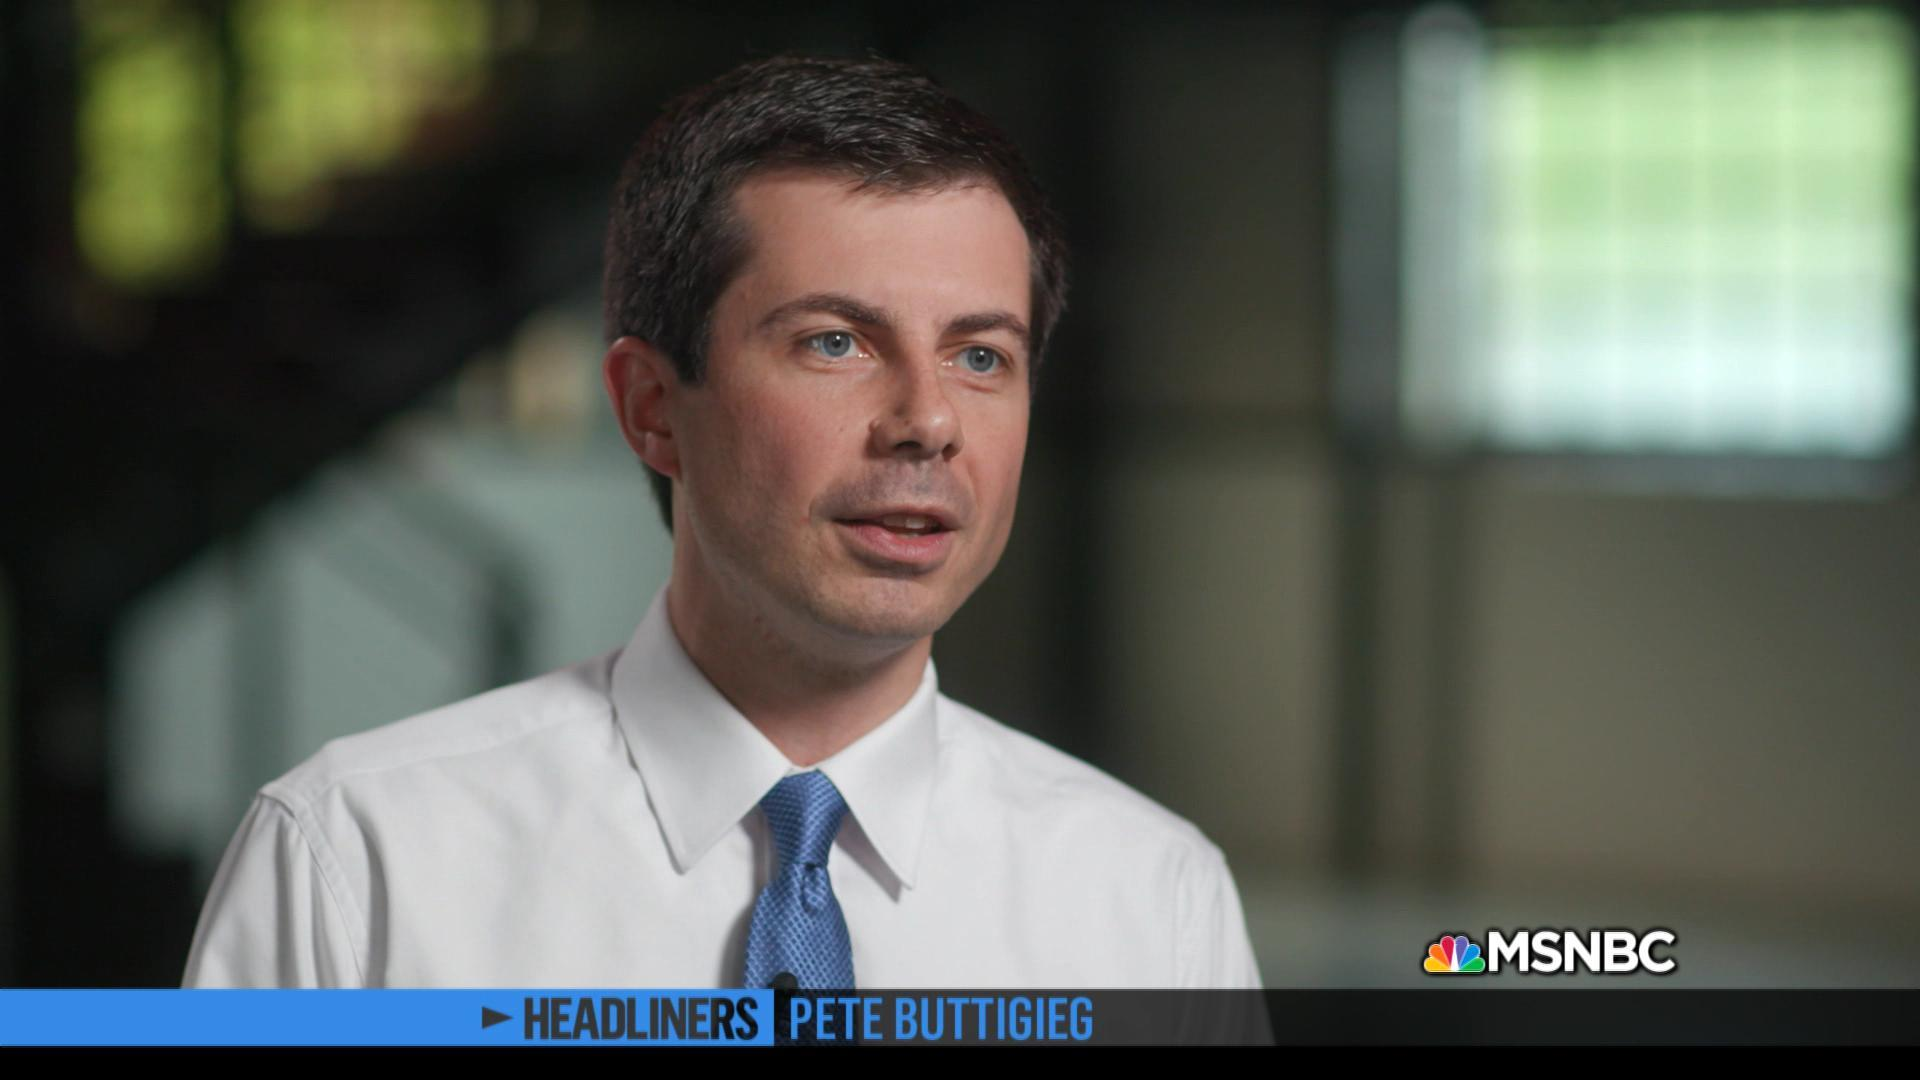 'Headliners: Pete Buttigieg' On Military Service